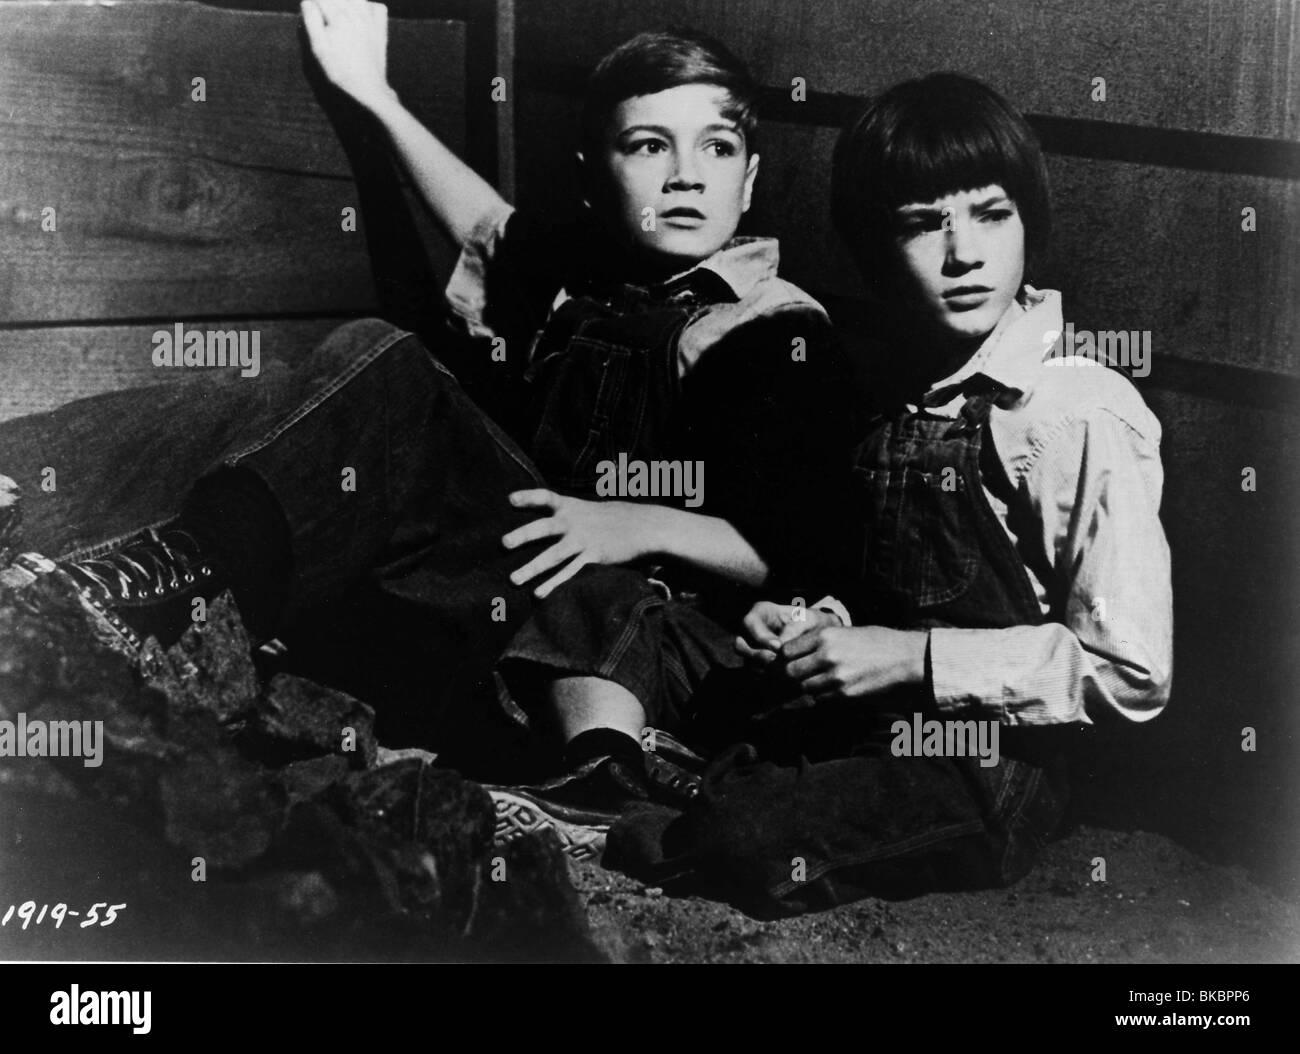 TO KILL A MOCKINGBIRD (1962) PHILLIP ALFORD, MARY BADHAM TKM 022P - Stock Image